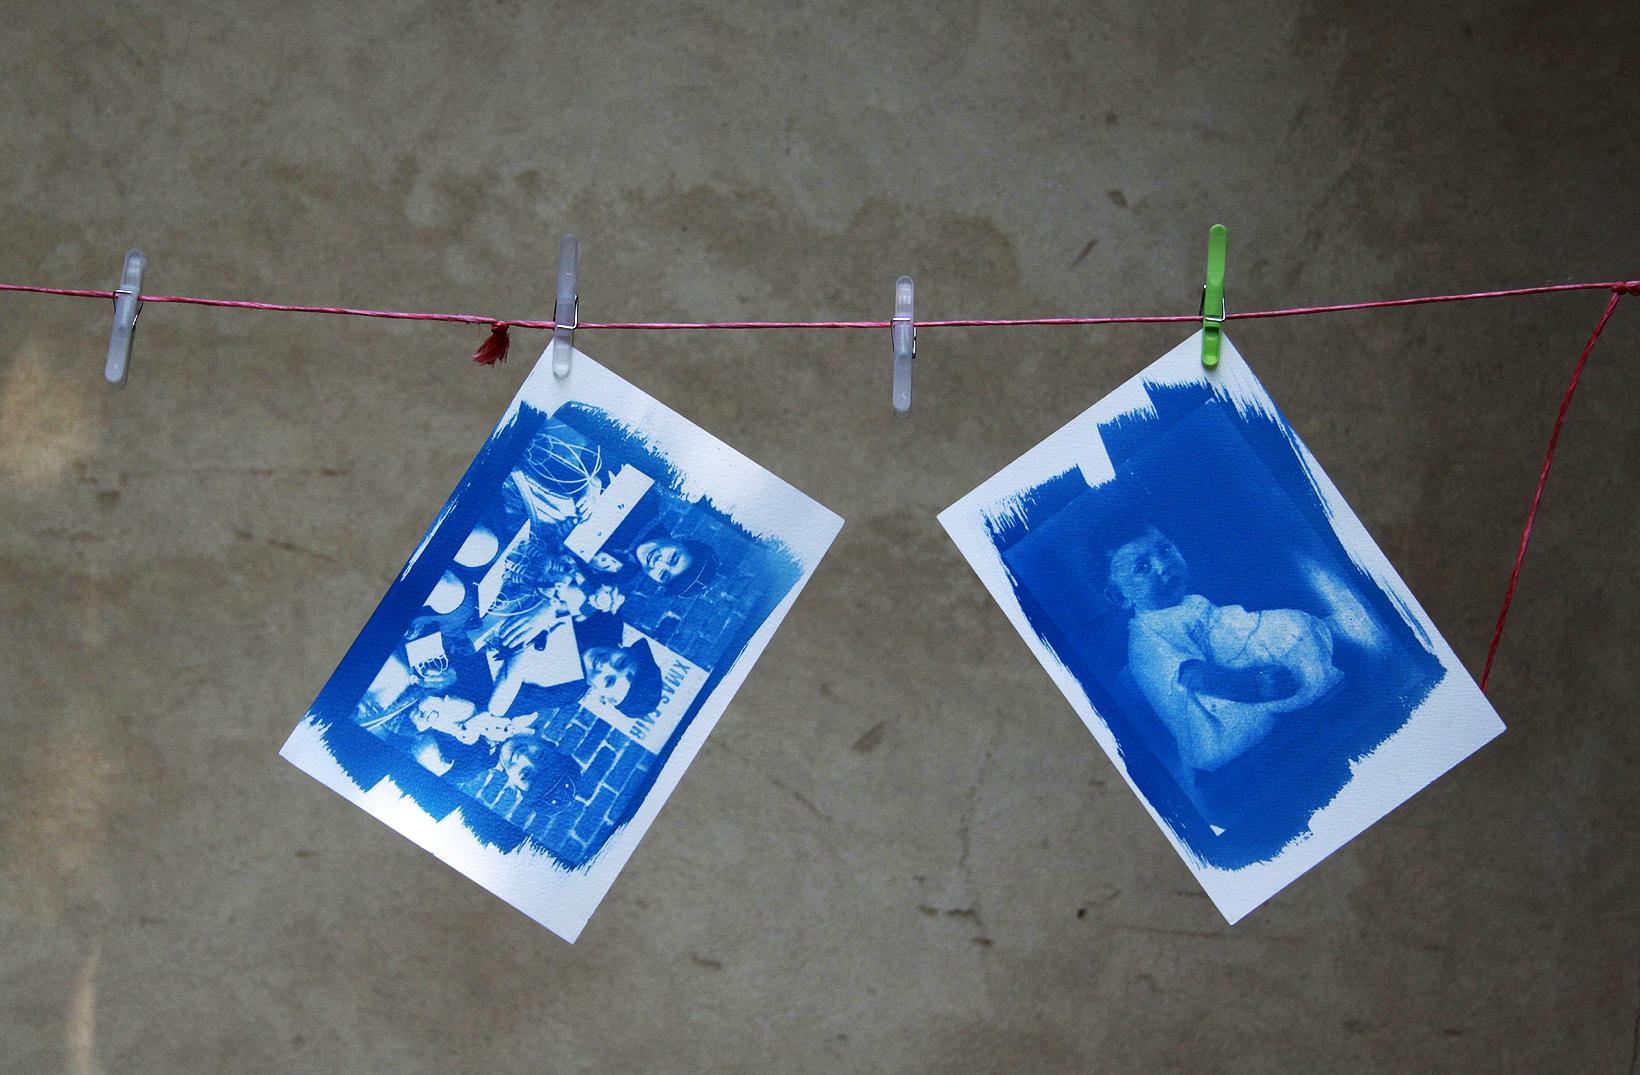 Fotosynthesis_Hackney City Farm Intergenerational Project_Cyanotype (1).jpg